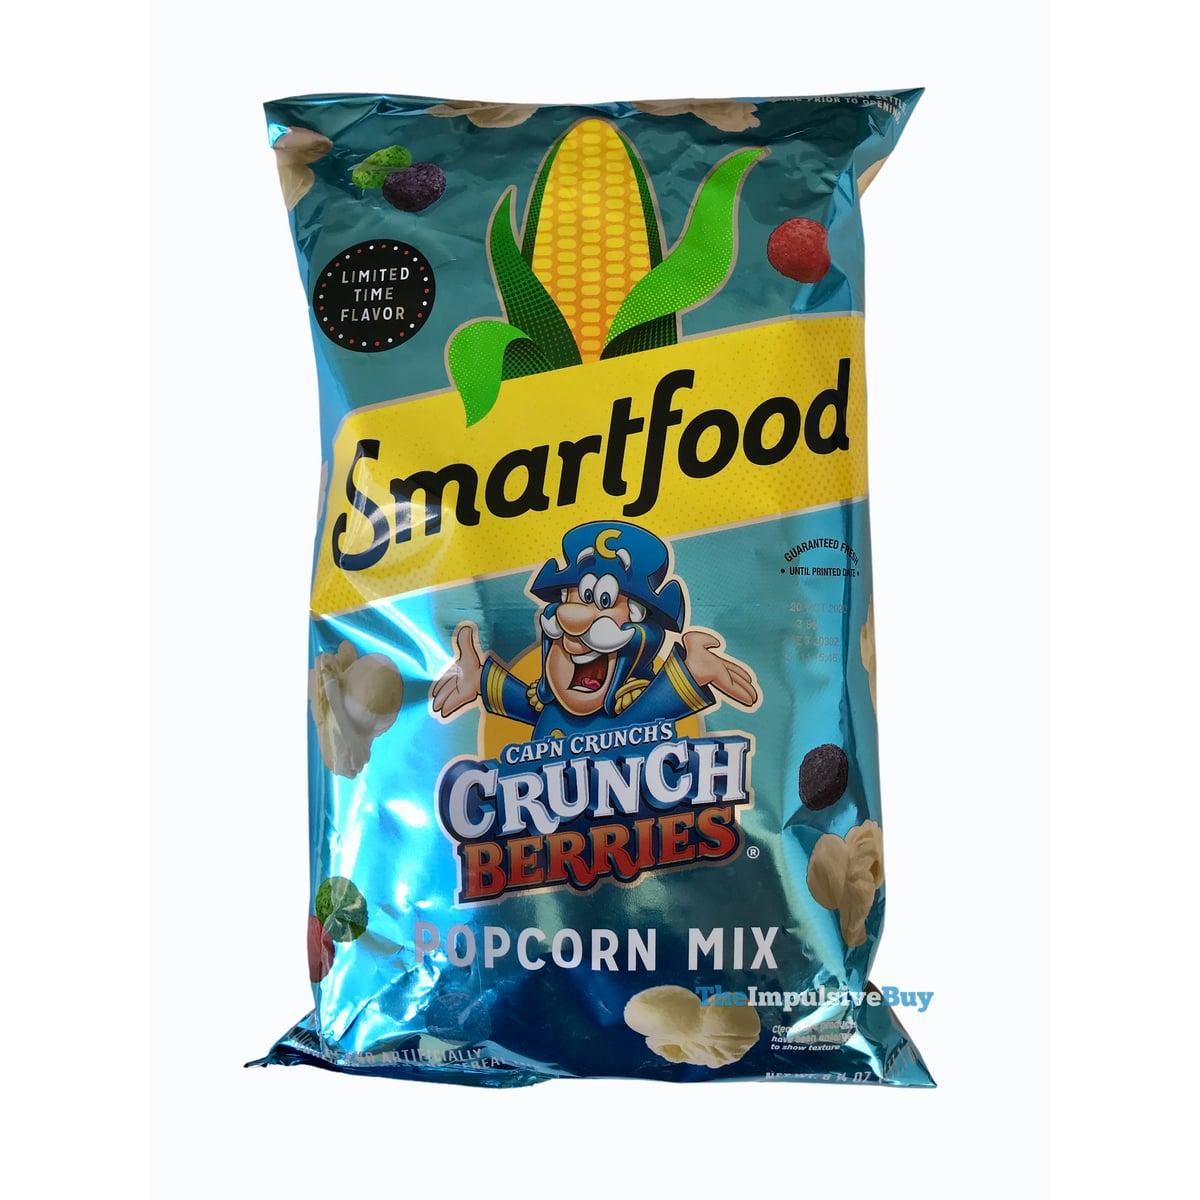 Review Smartfood Cap N Crunch S Crunch Berries Popcorn Mix The Impulsive Buy Well you're in luck, because here they come. crunch berries popcorn mix